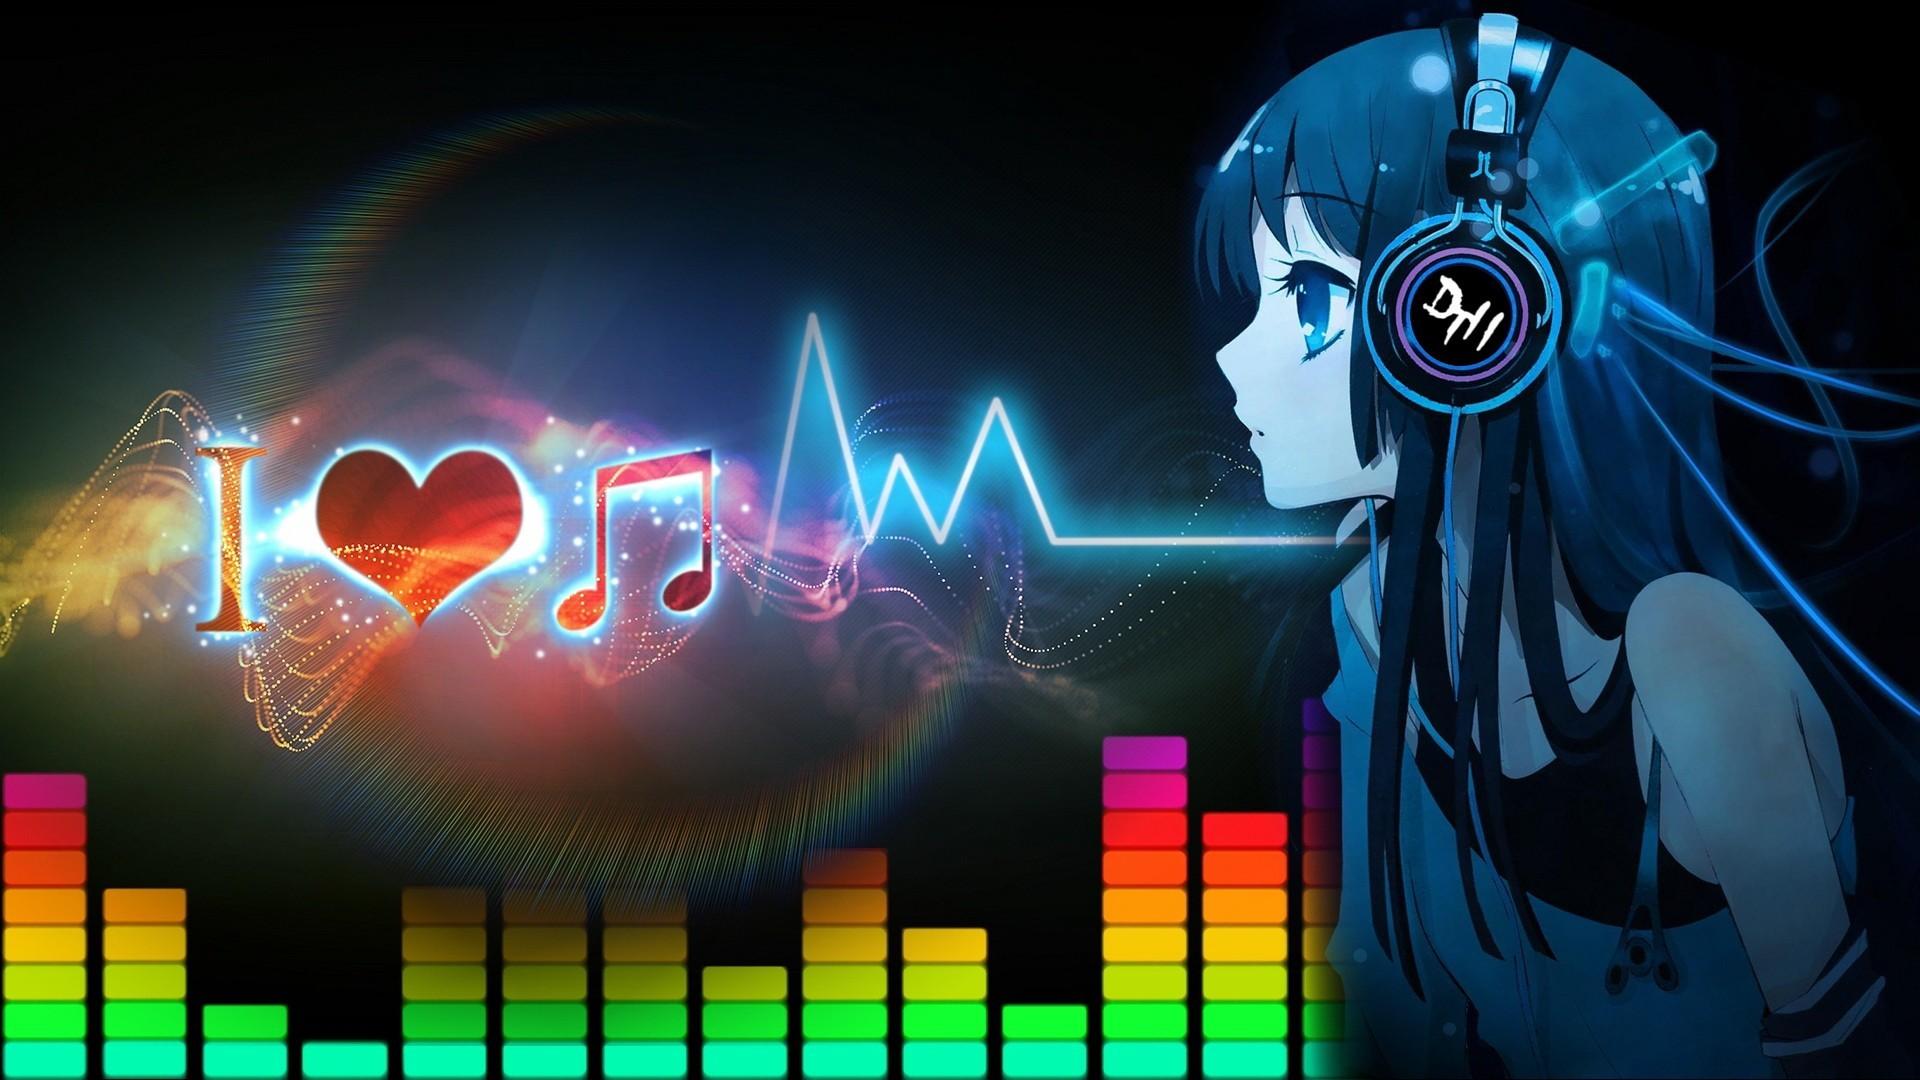 0 Cute Anime Girls Listening Music Wallpaper HD For Desktop Cute Anime  Wallpapers Widescreen For Iphone Dark Scenery Cute .